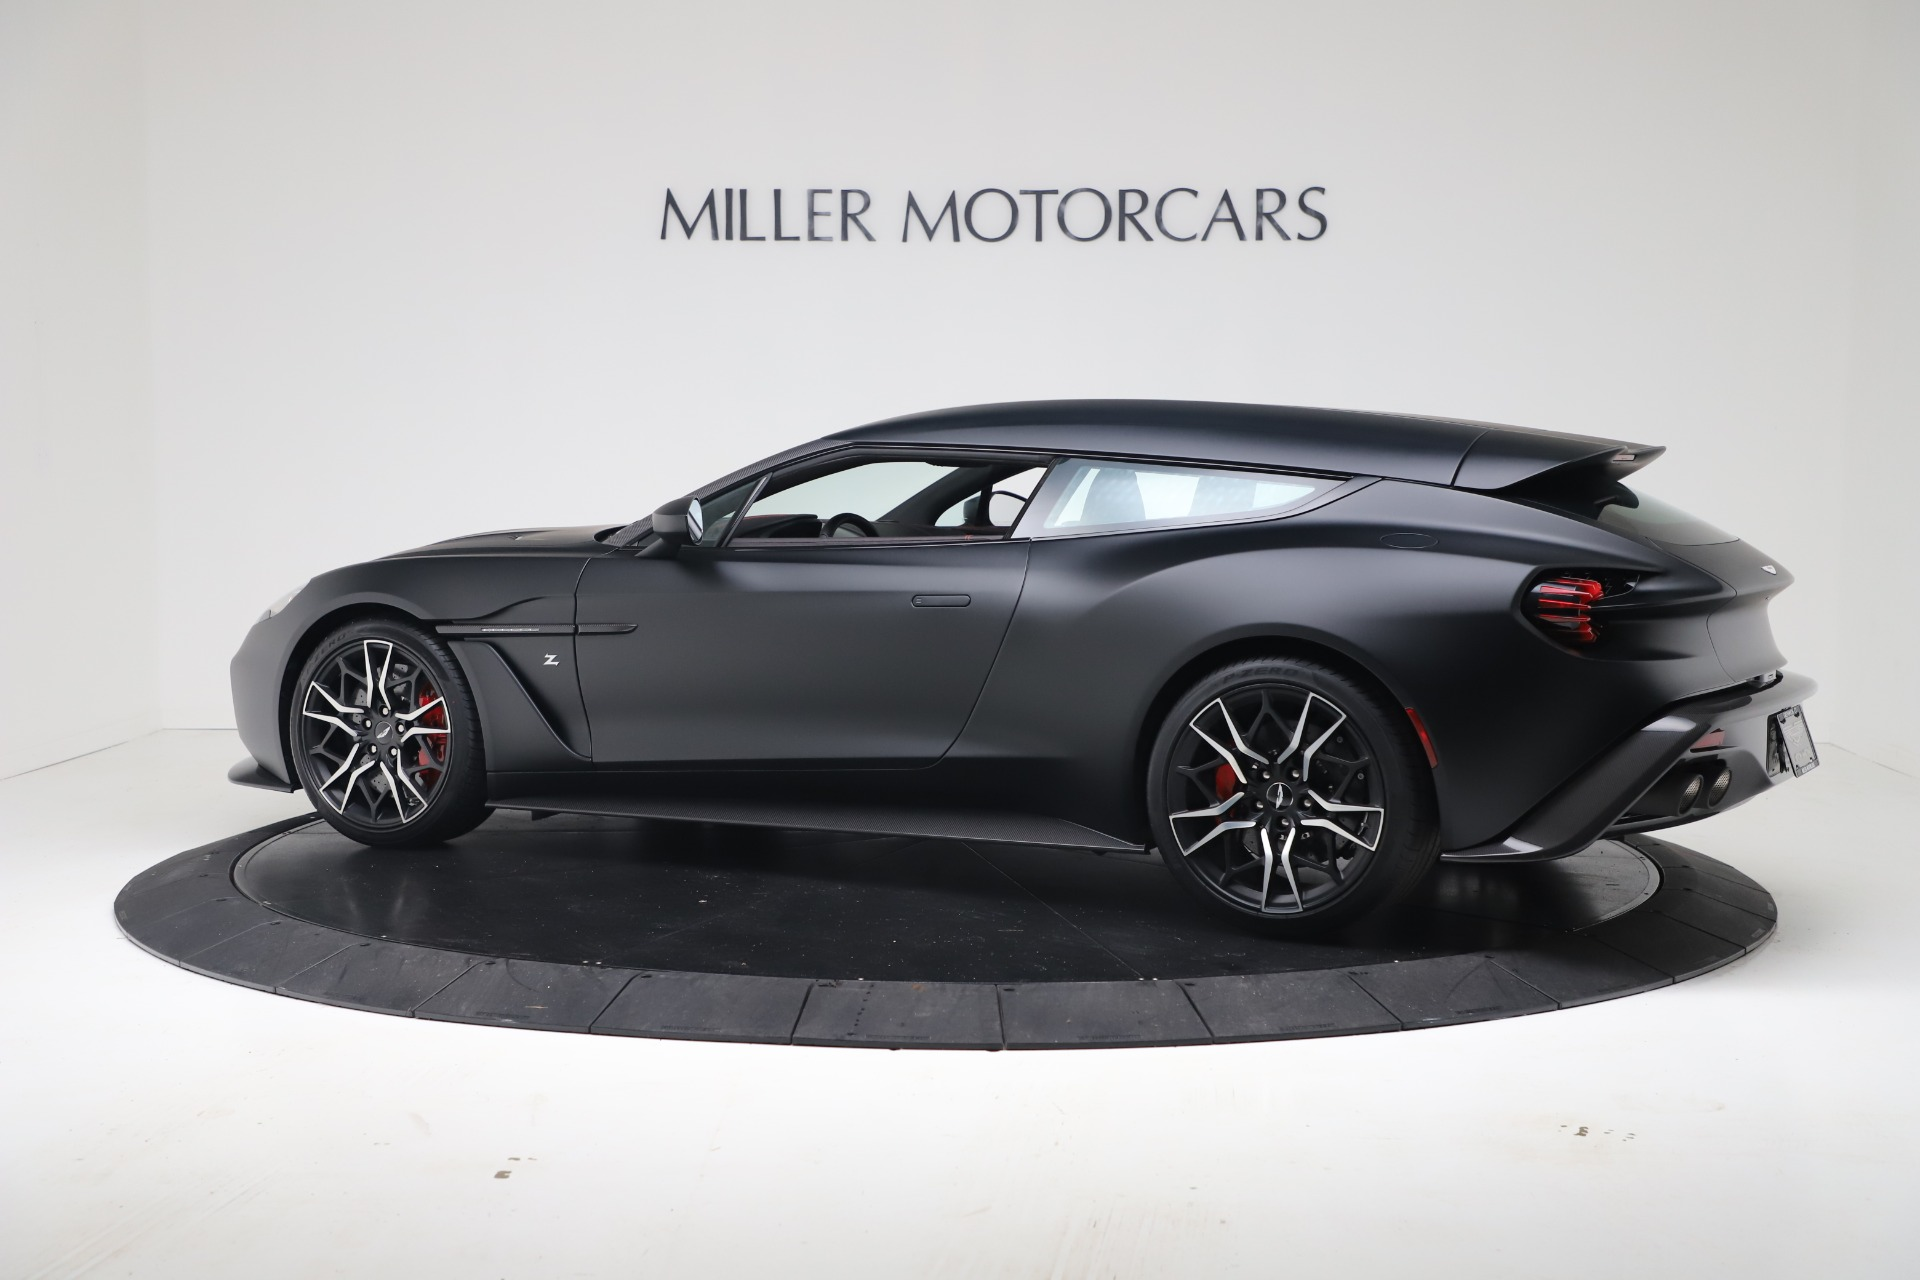 New 2019 Aston Martin Vanquish Shooting Brake For Sale In Westport, CT 3512_p4